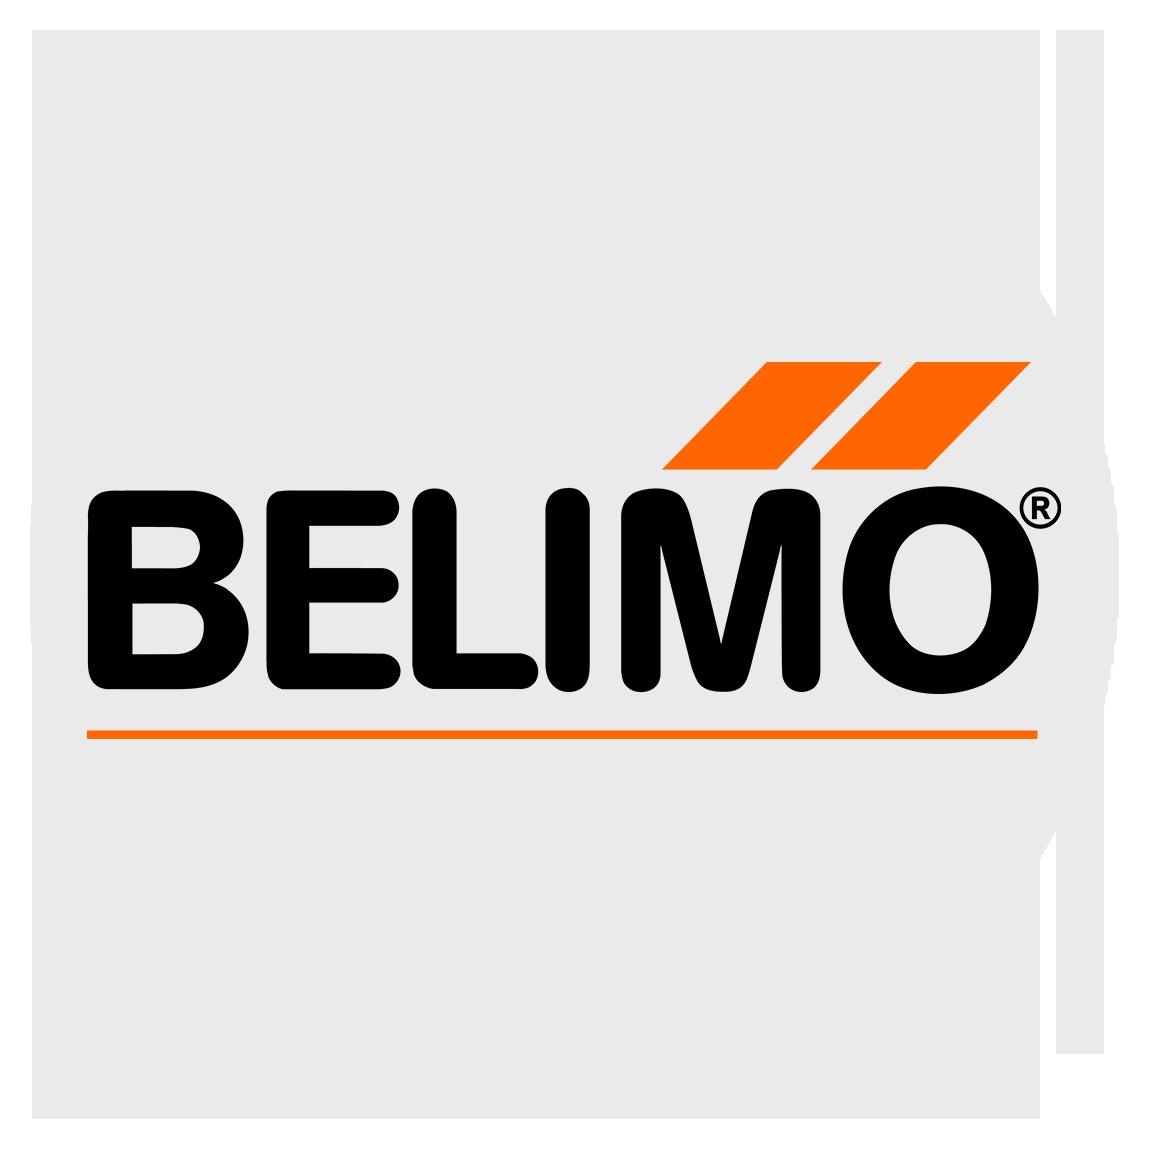 http://walterscontrols.net/wp-content/uploads/2019/12/belimo.png